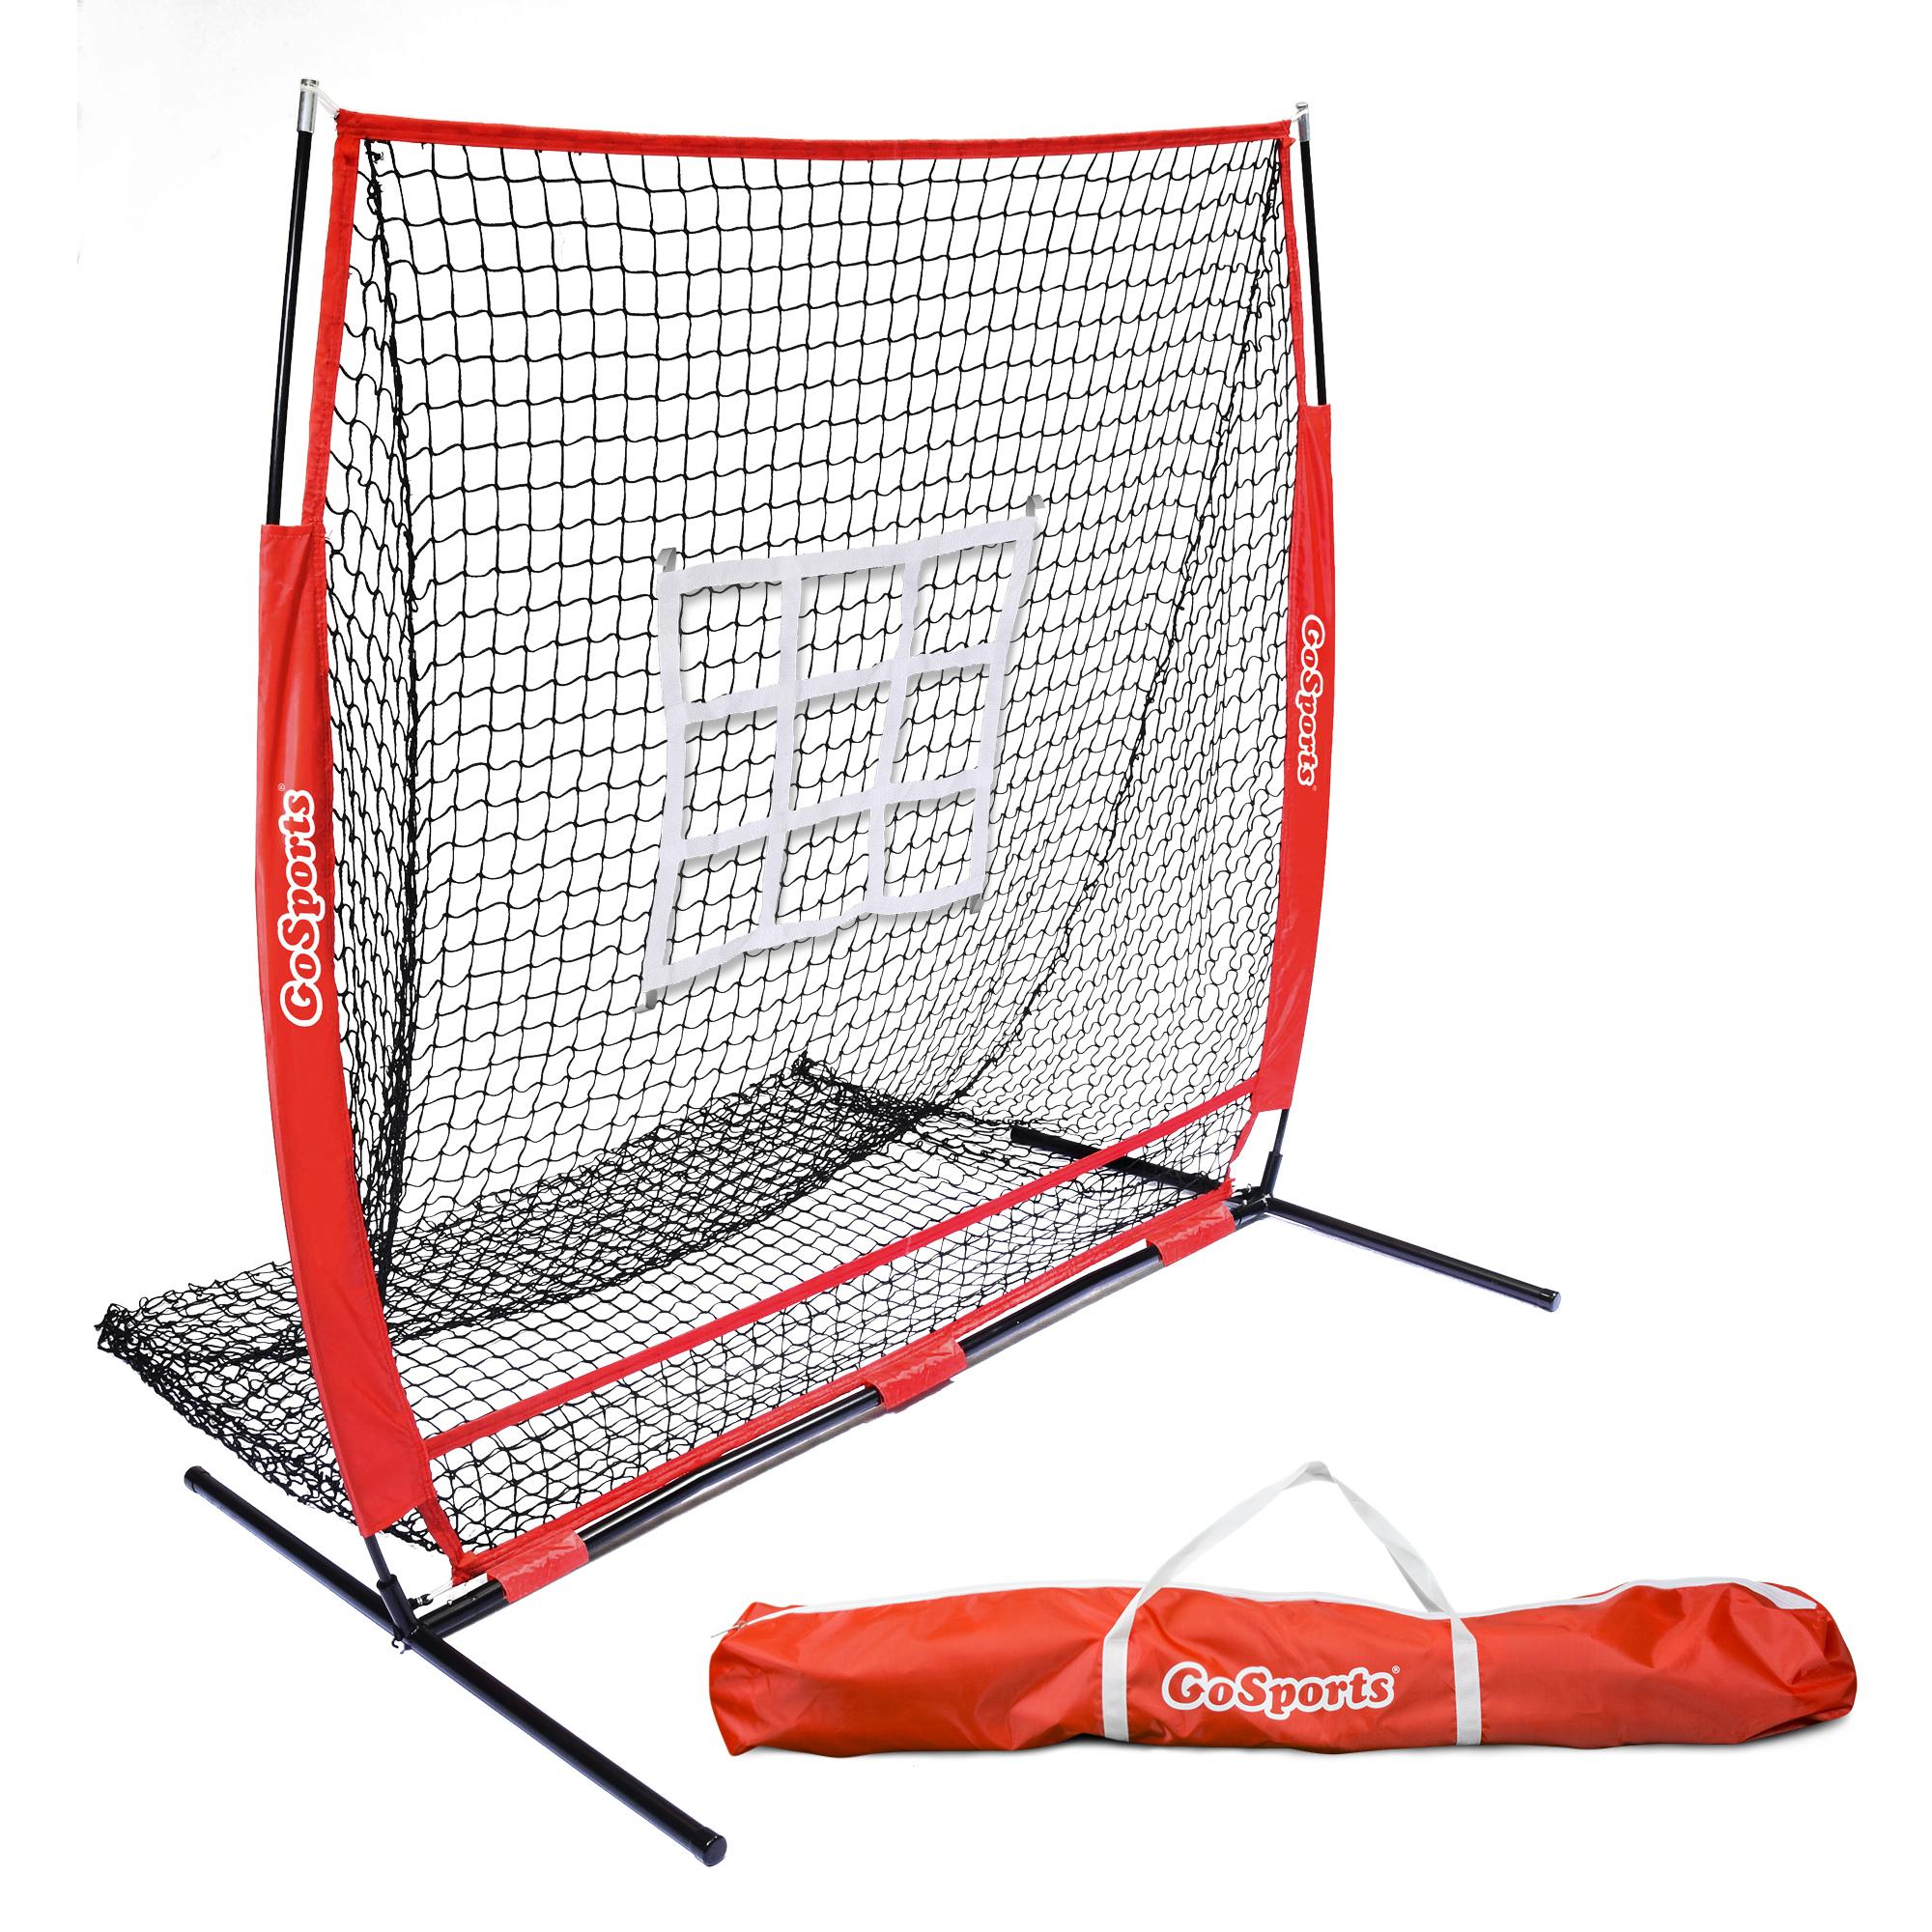 GoSports 5'x5' Baseball & Softball Practice Pitching & Fielding Net with Bonus Strike Zone